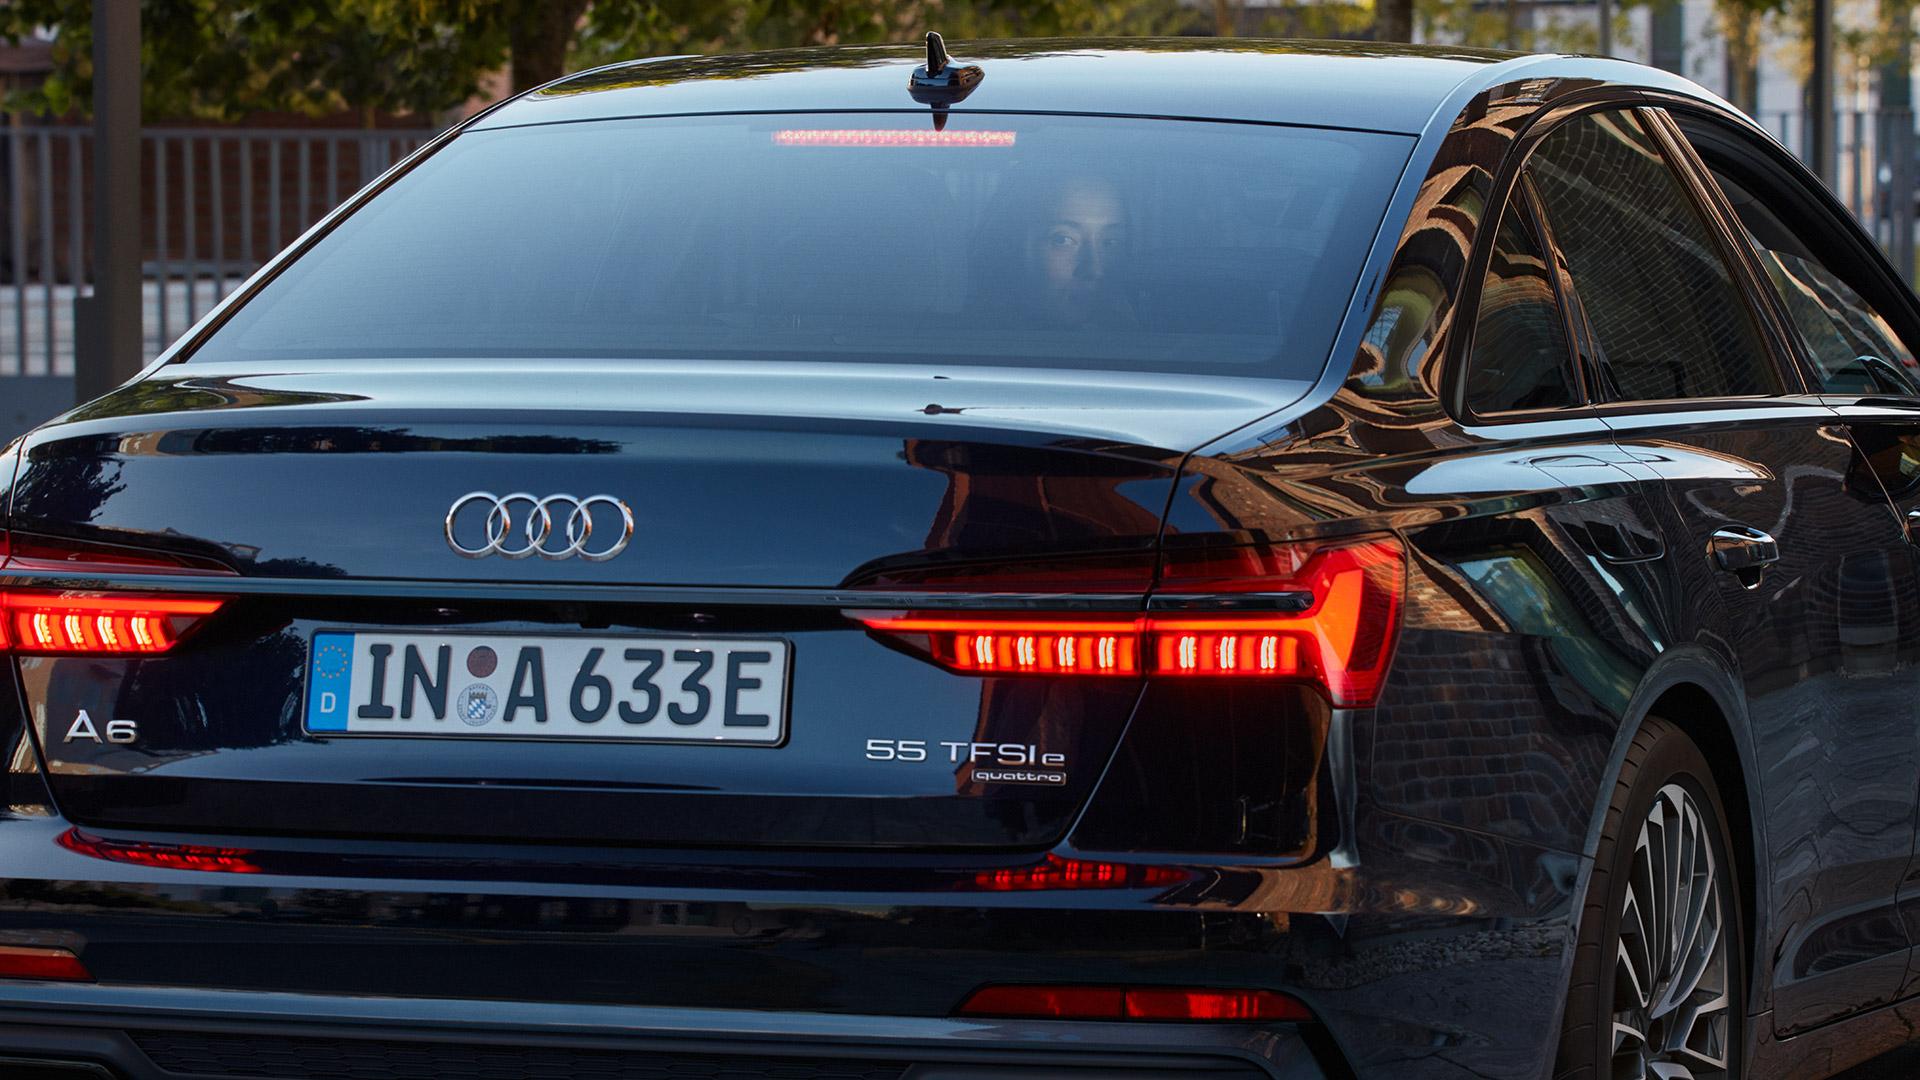 Audi A6 Limousine TFSI e quattro